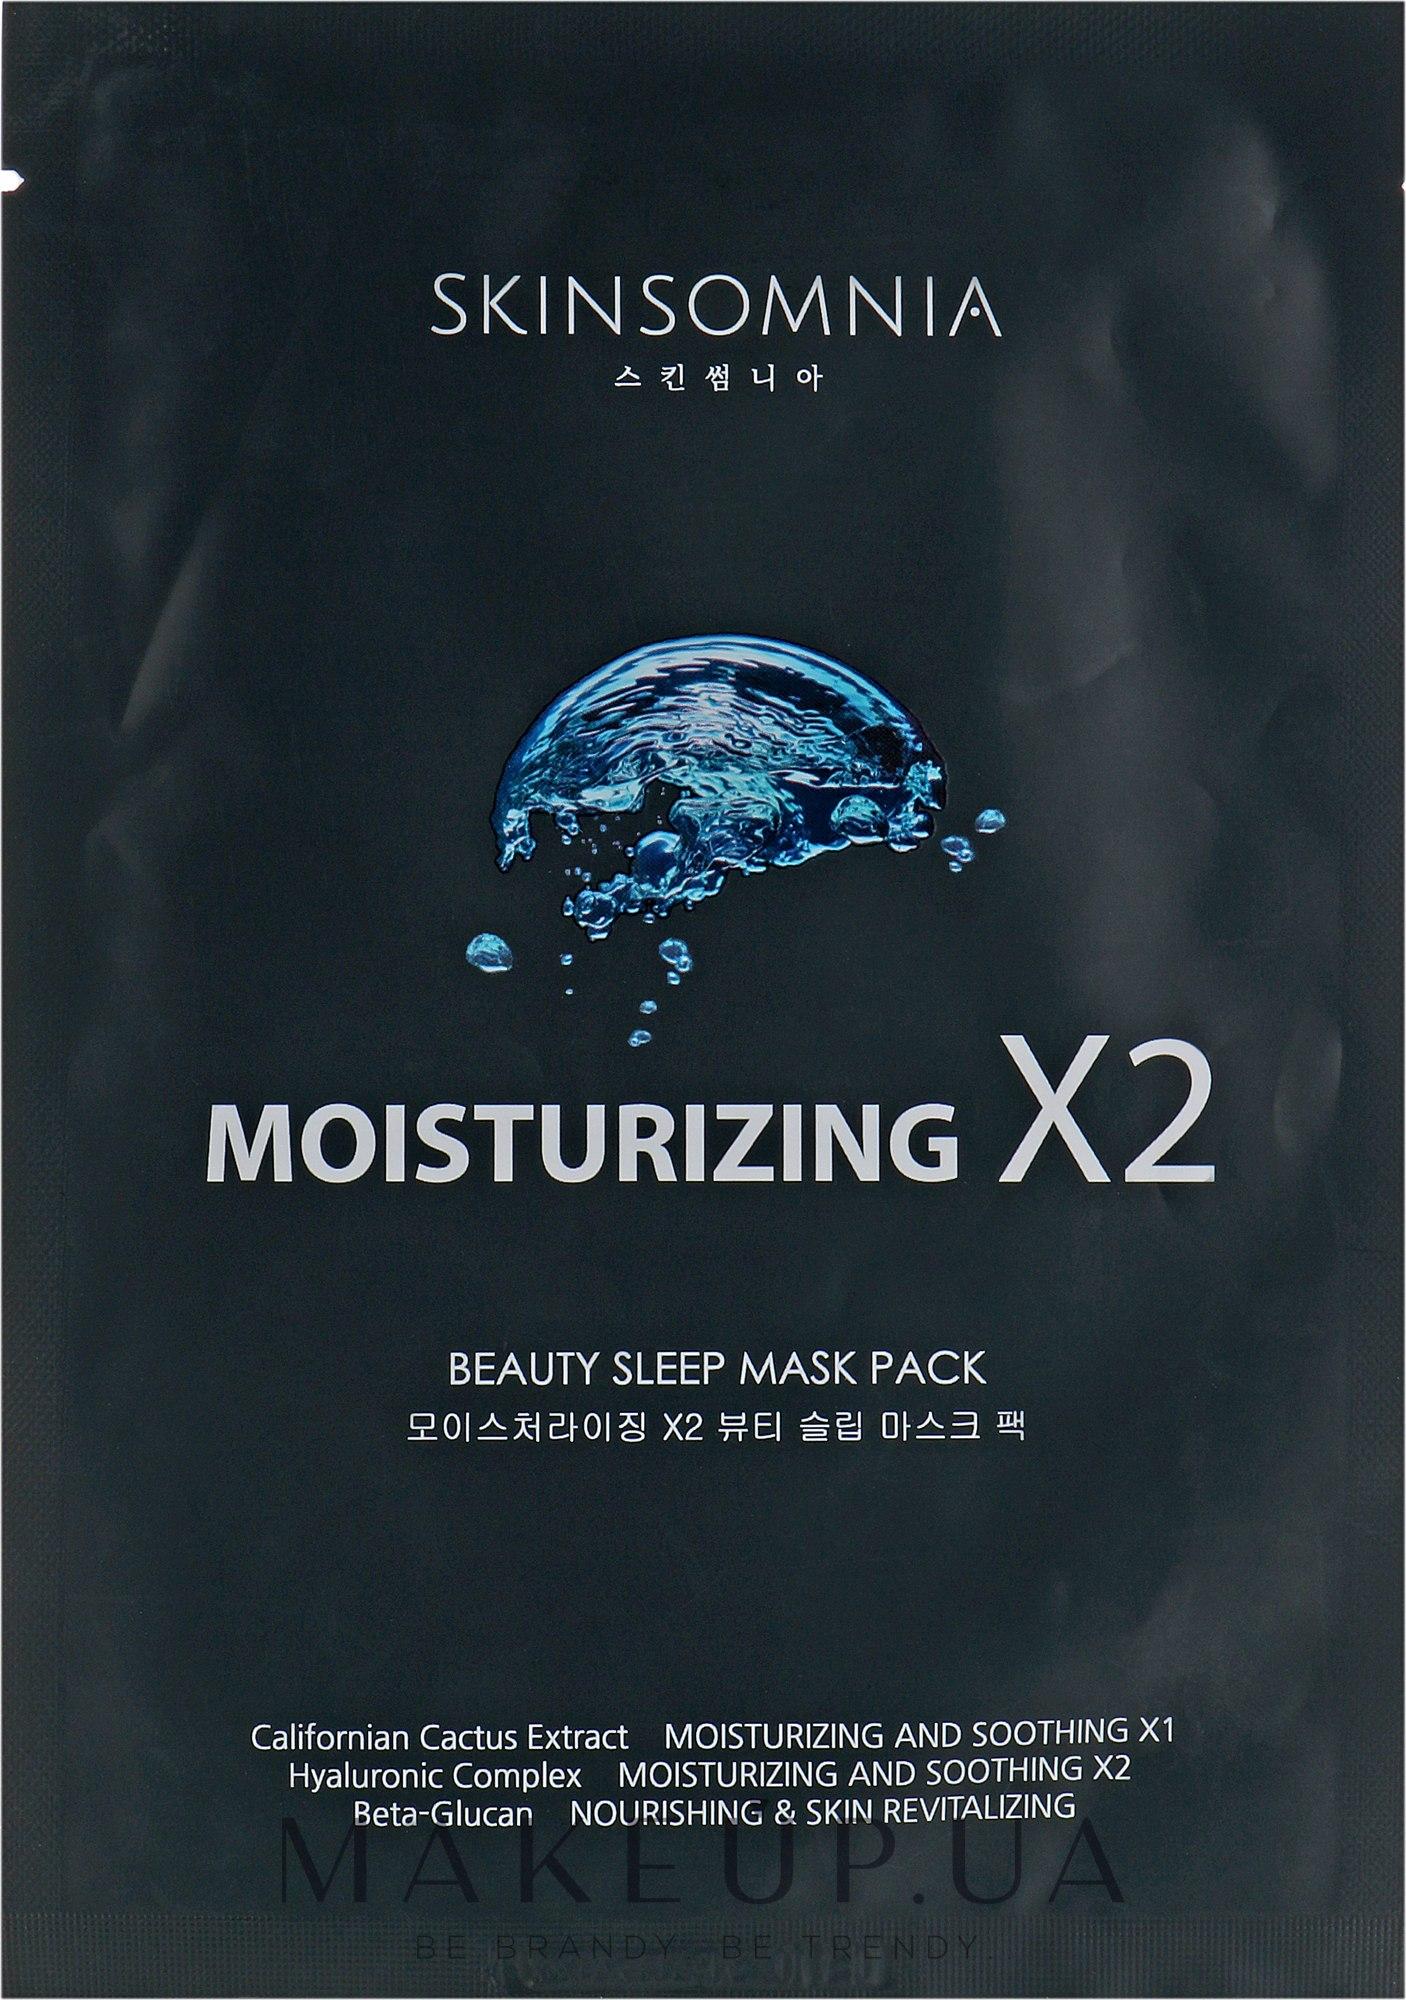 Маска для лица увлажнение 2х эффект бьюти-слип - Skinsomnia Moisturizing X2 Beauty Sleep Mask Pack — фото 20ml